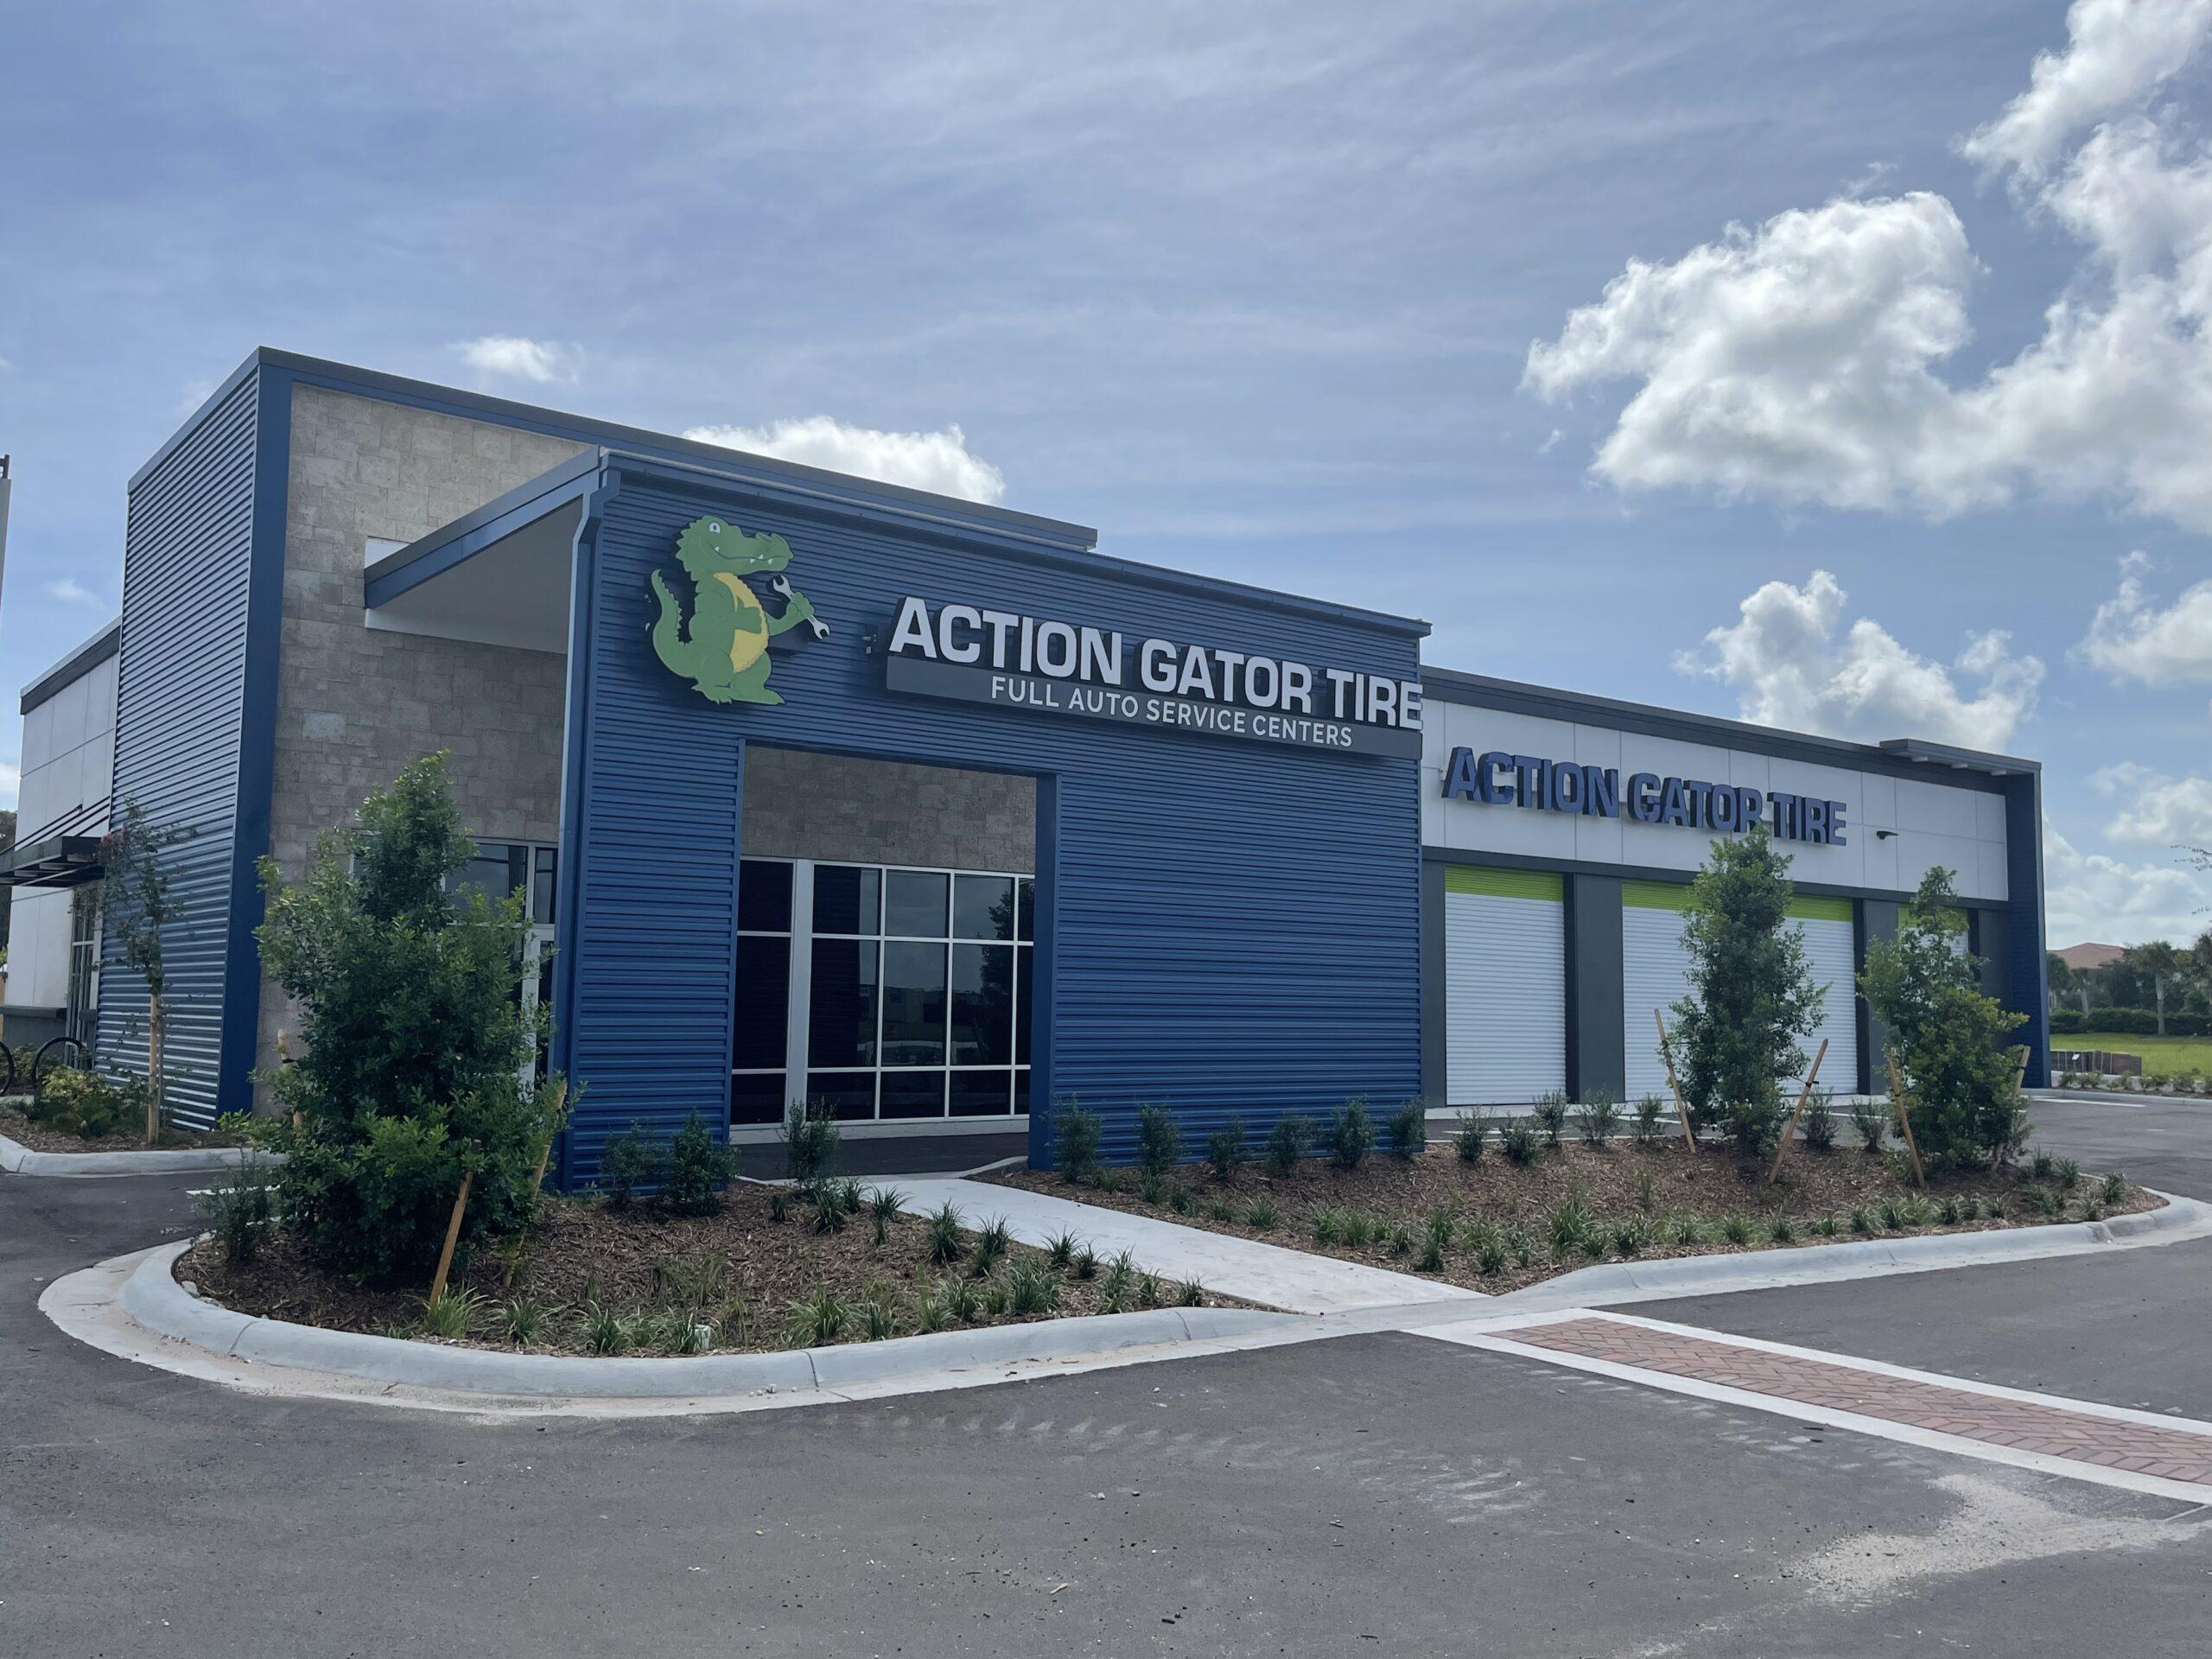 Action Gator Tire Orlando